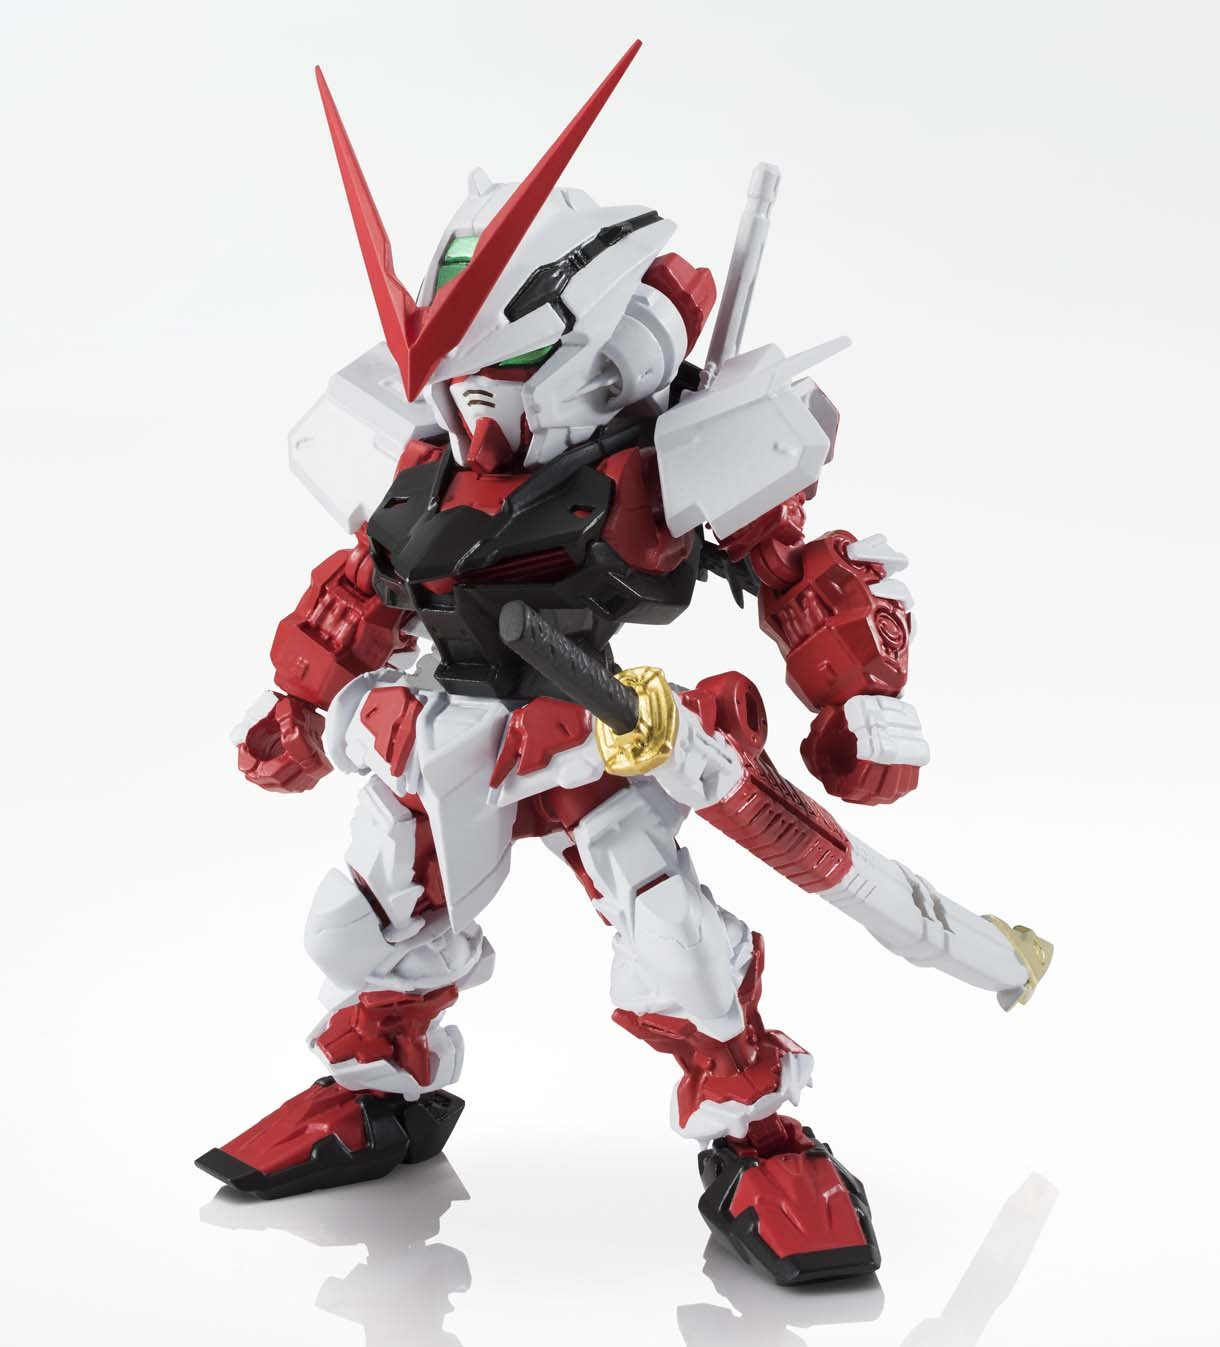 Bandai Tamashii Nationen Gundam Irre rot Rahmen Gundam Seed Astrays ...